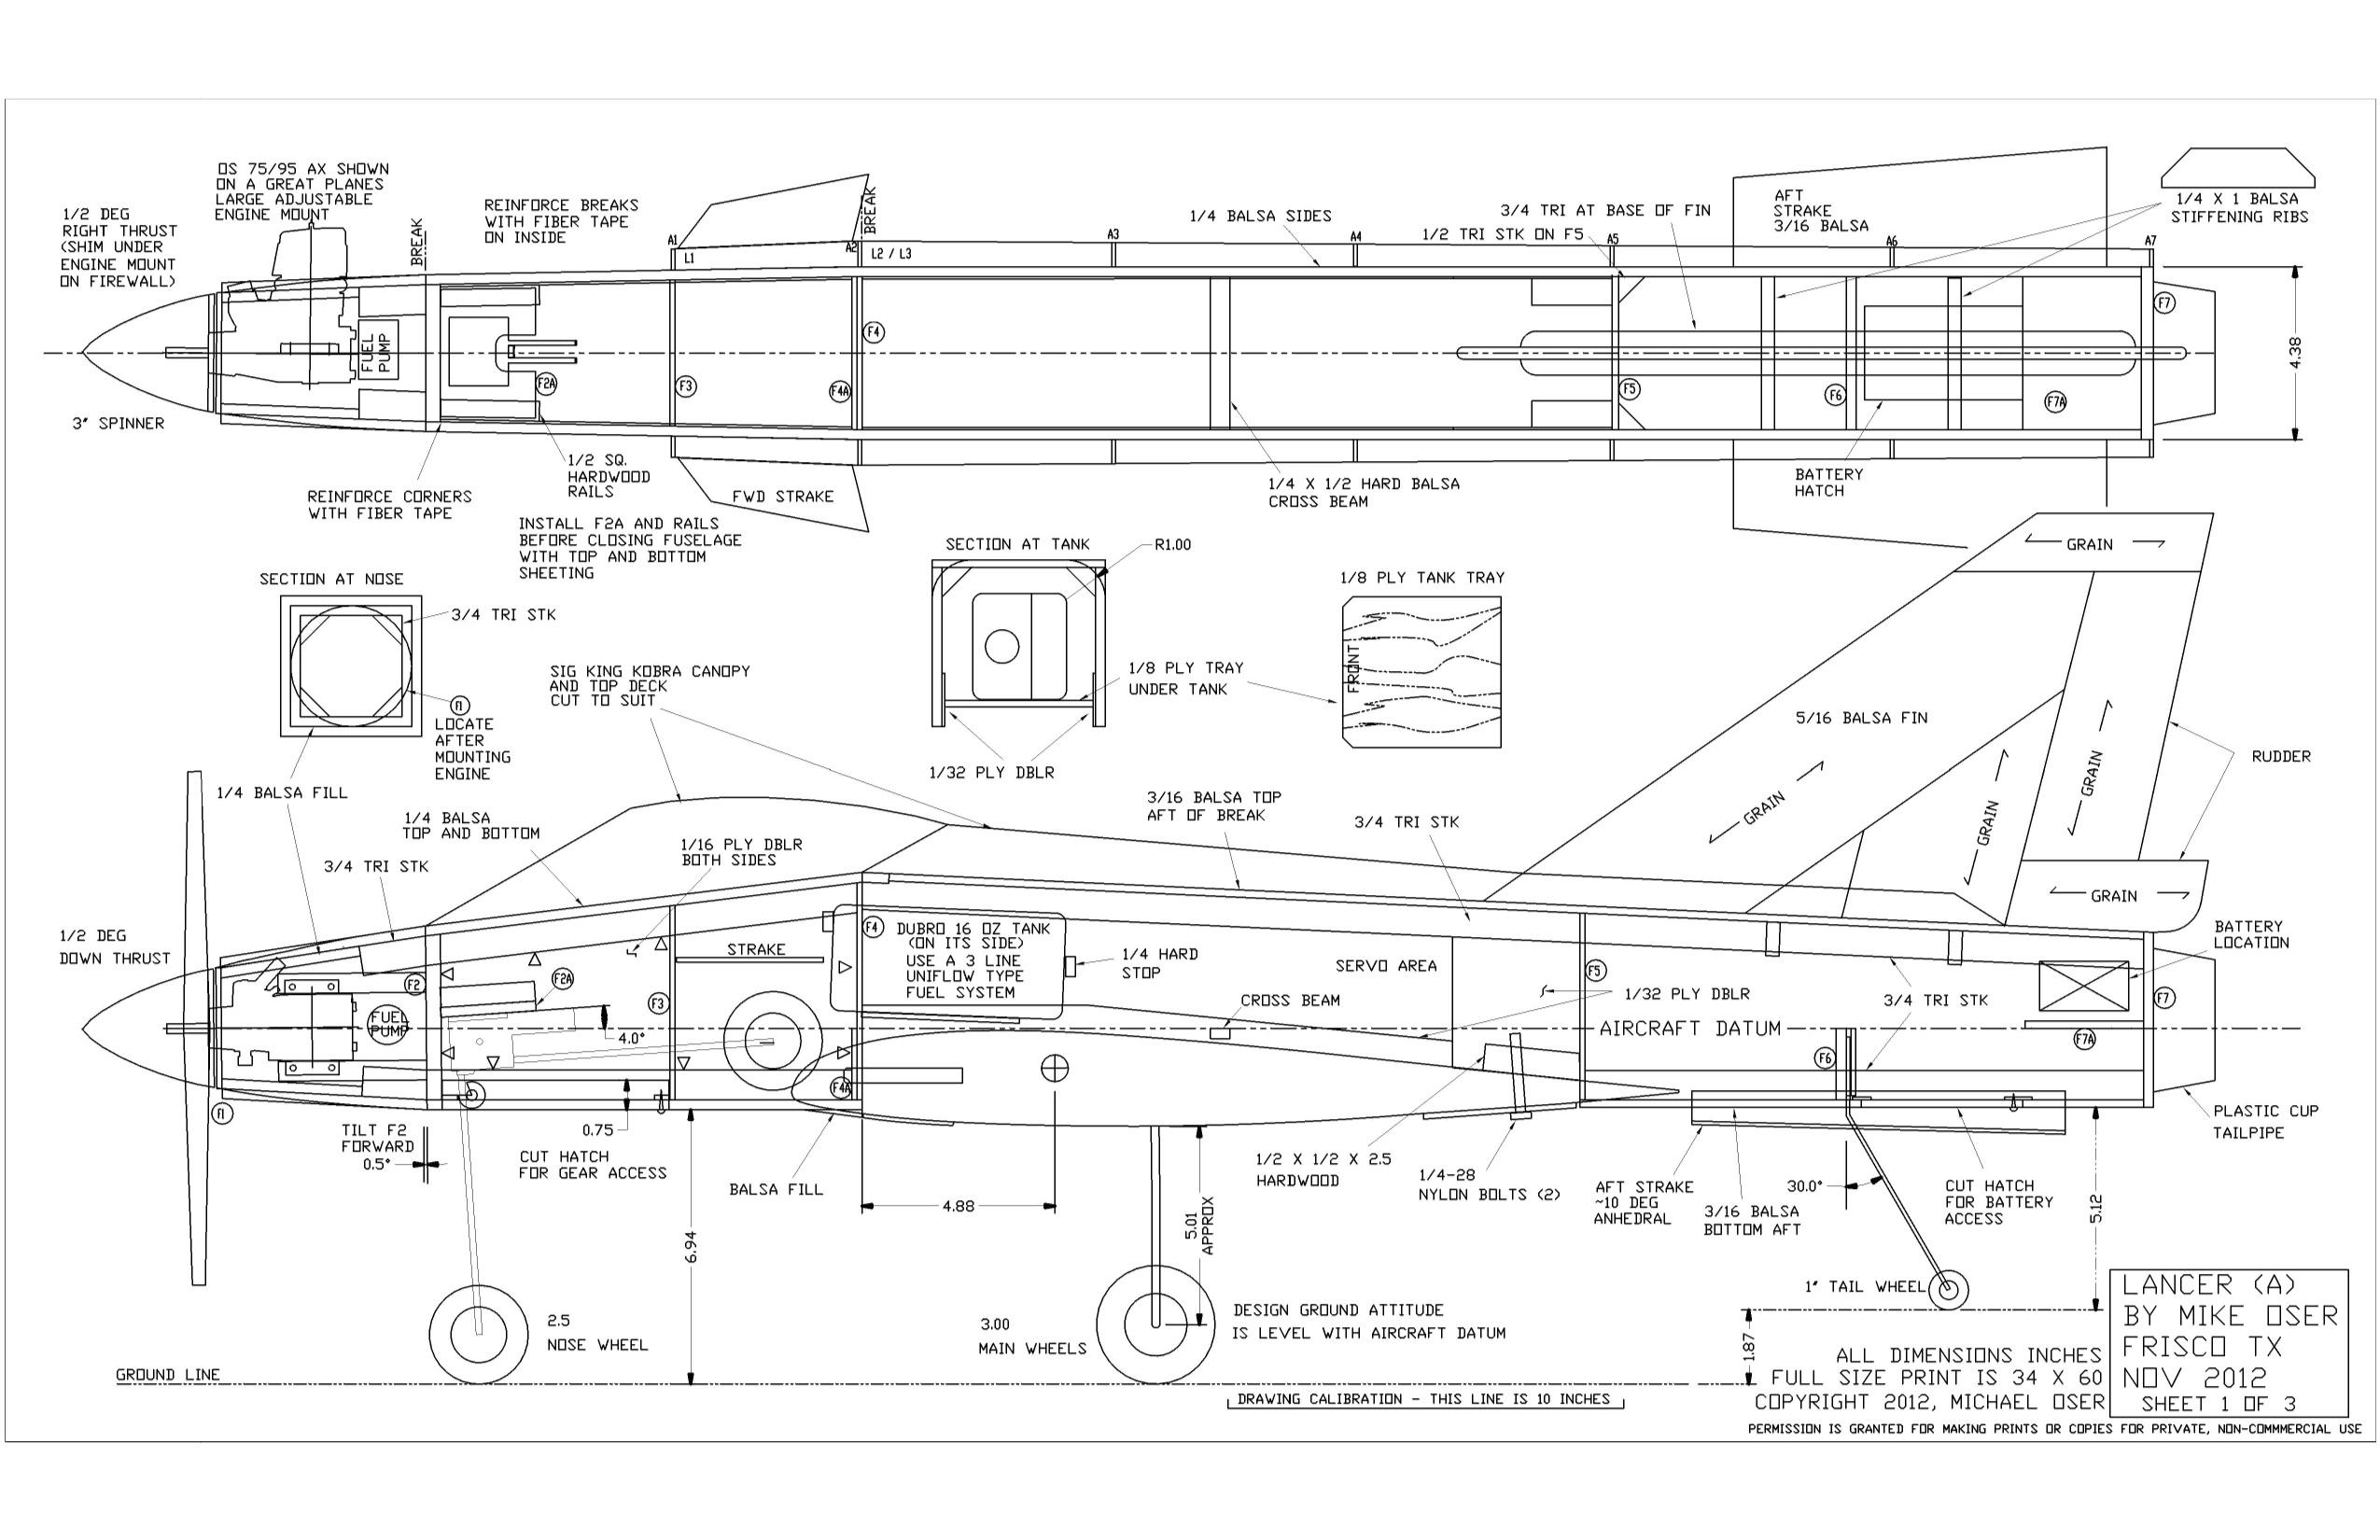 Click image for larger version  Name:Lancer Sht 1 (11x17).jpg Views:796 Size:687.9 KB ID:2064272